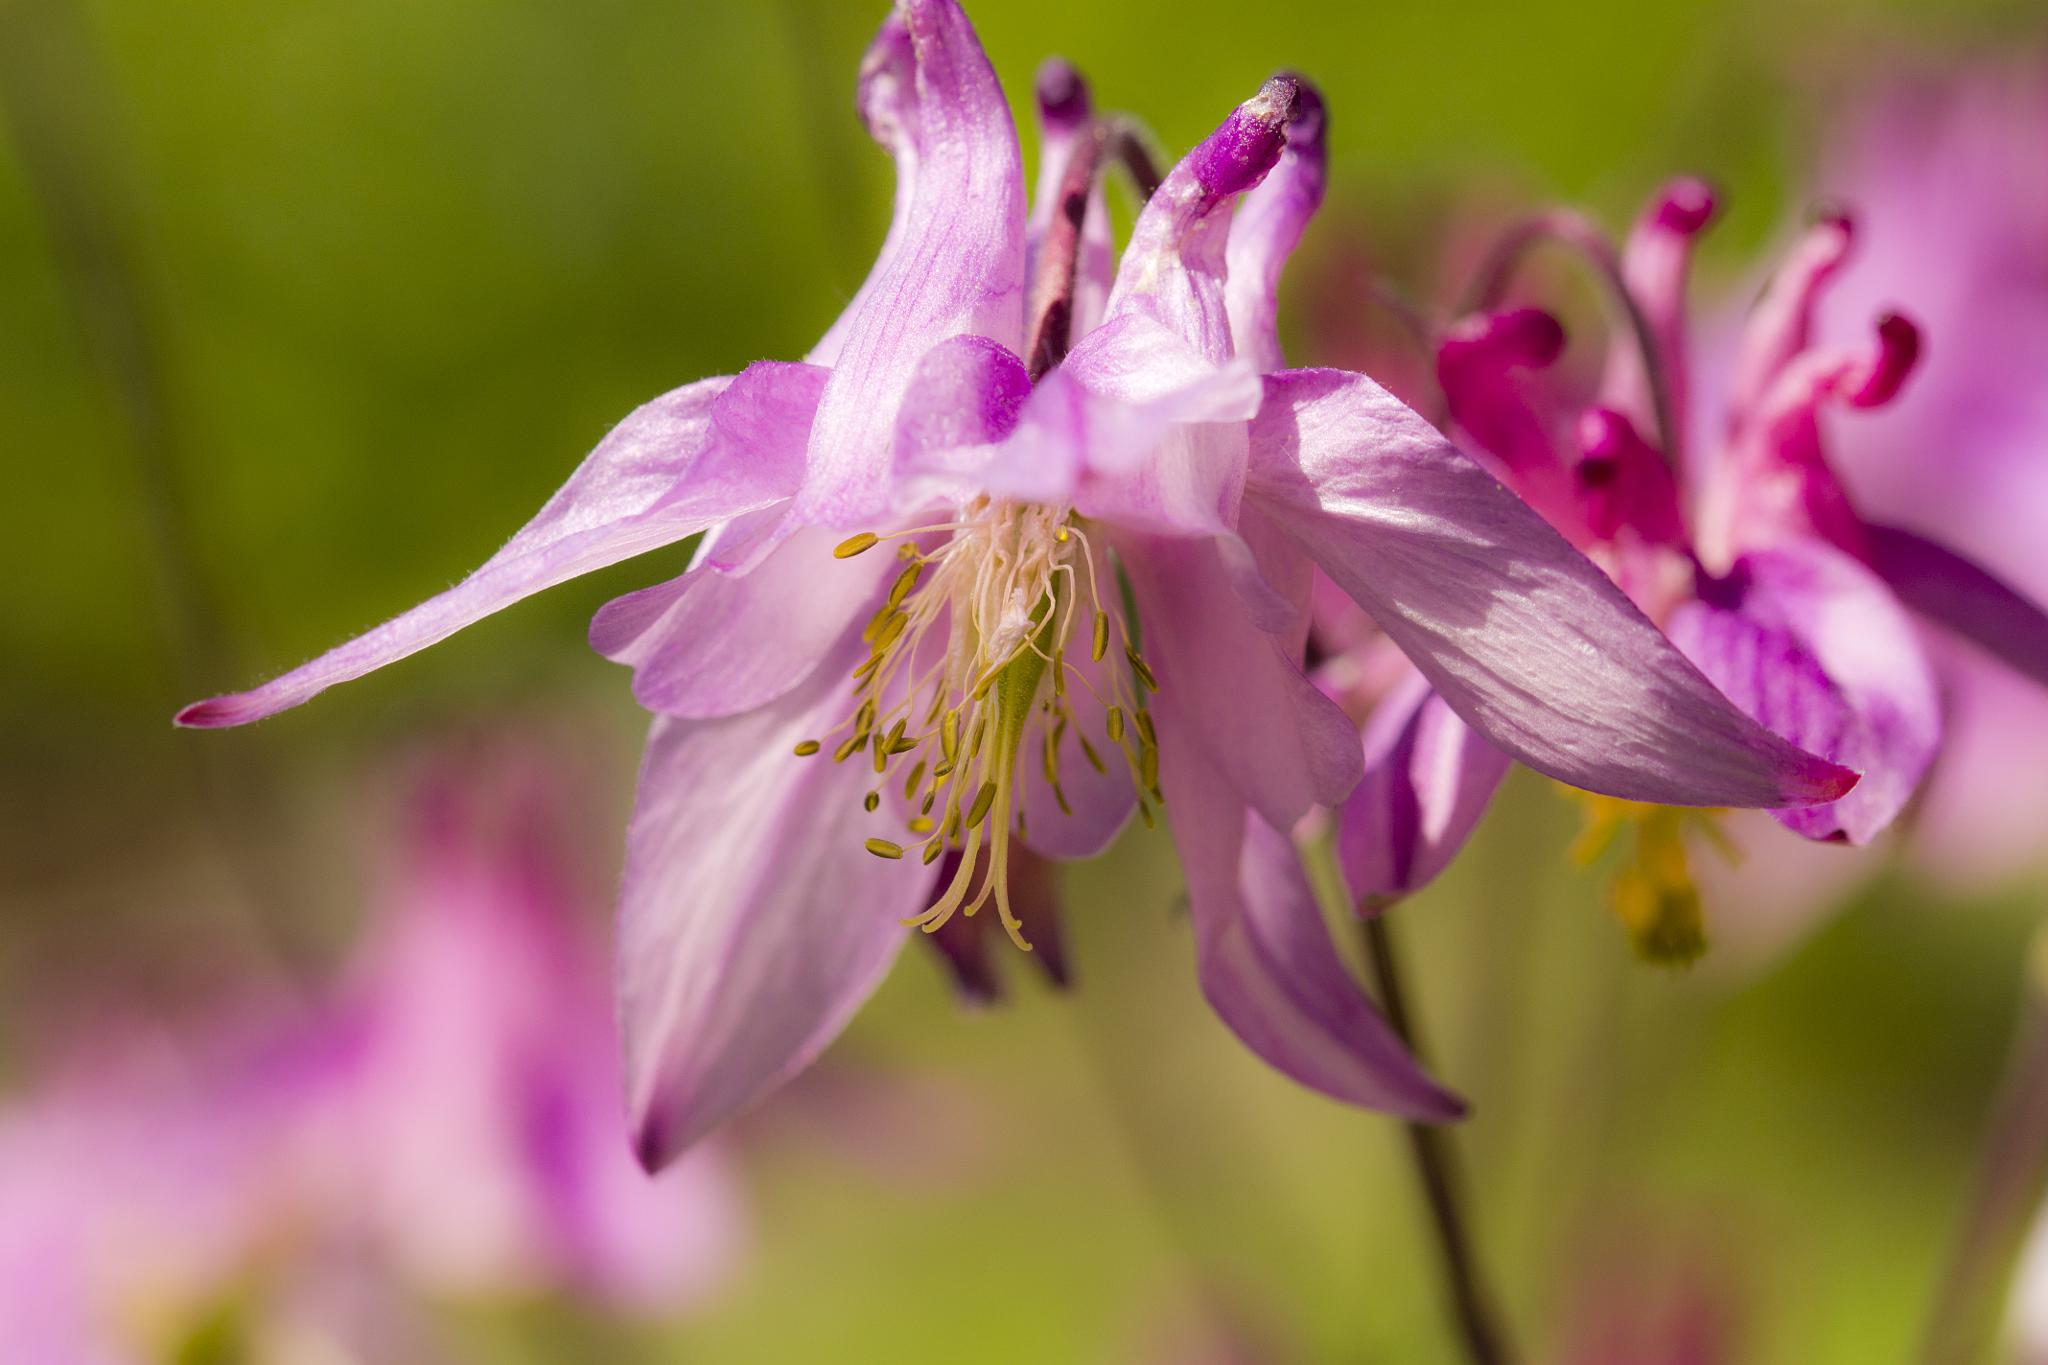 Dreamy lilac by sandra.hallenberg